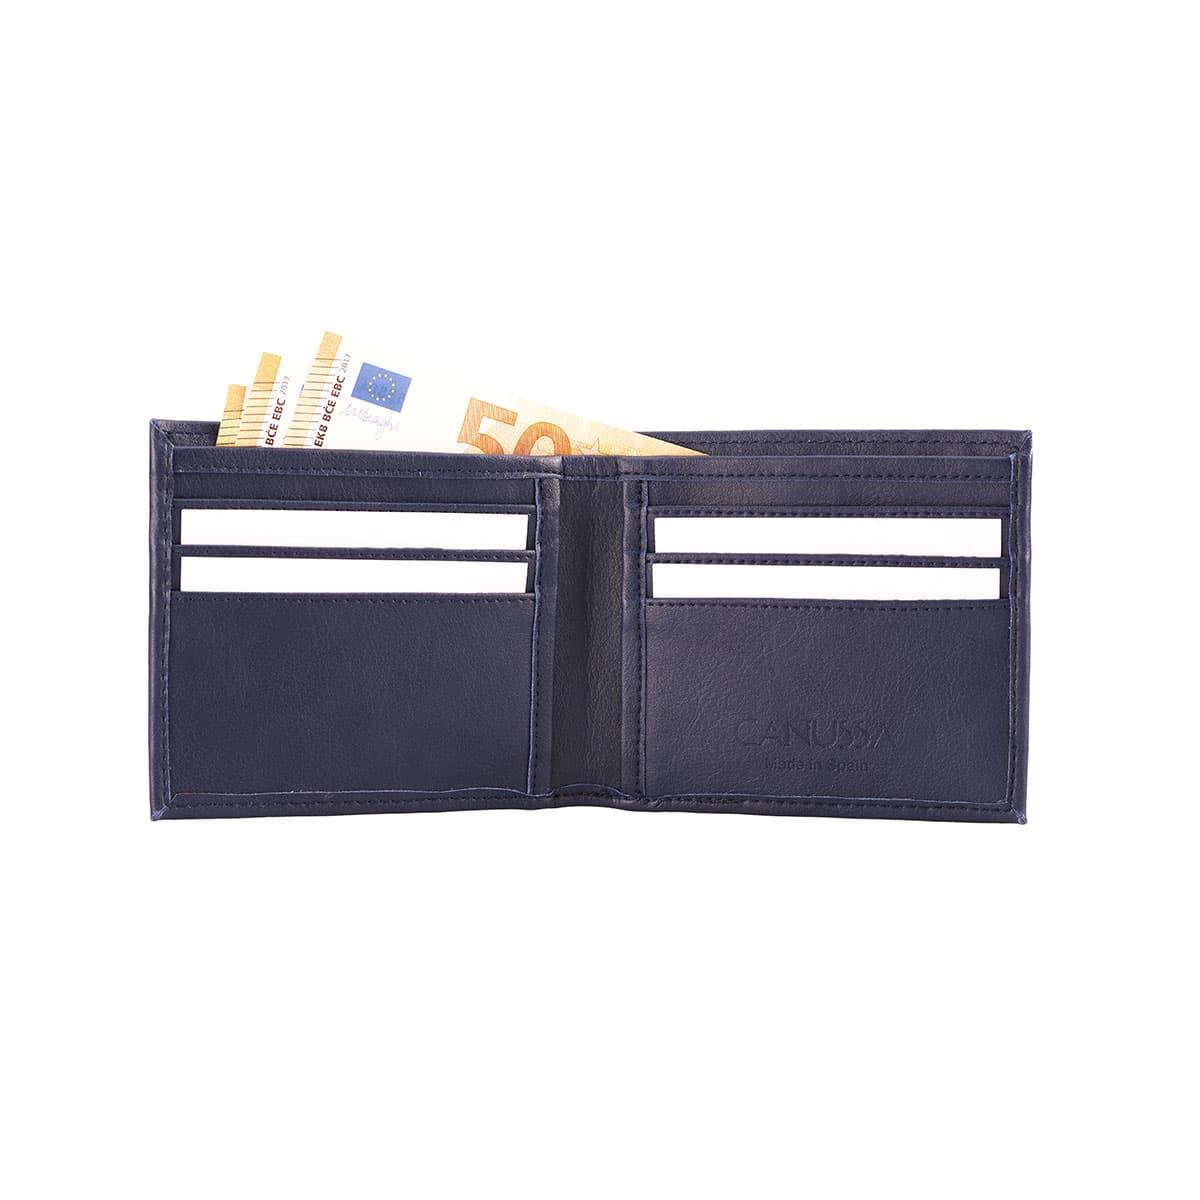 Interior cartera billetera color azul